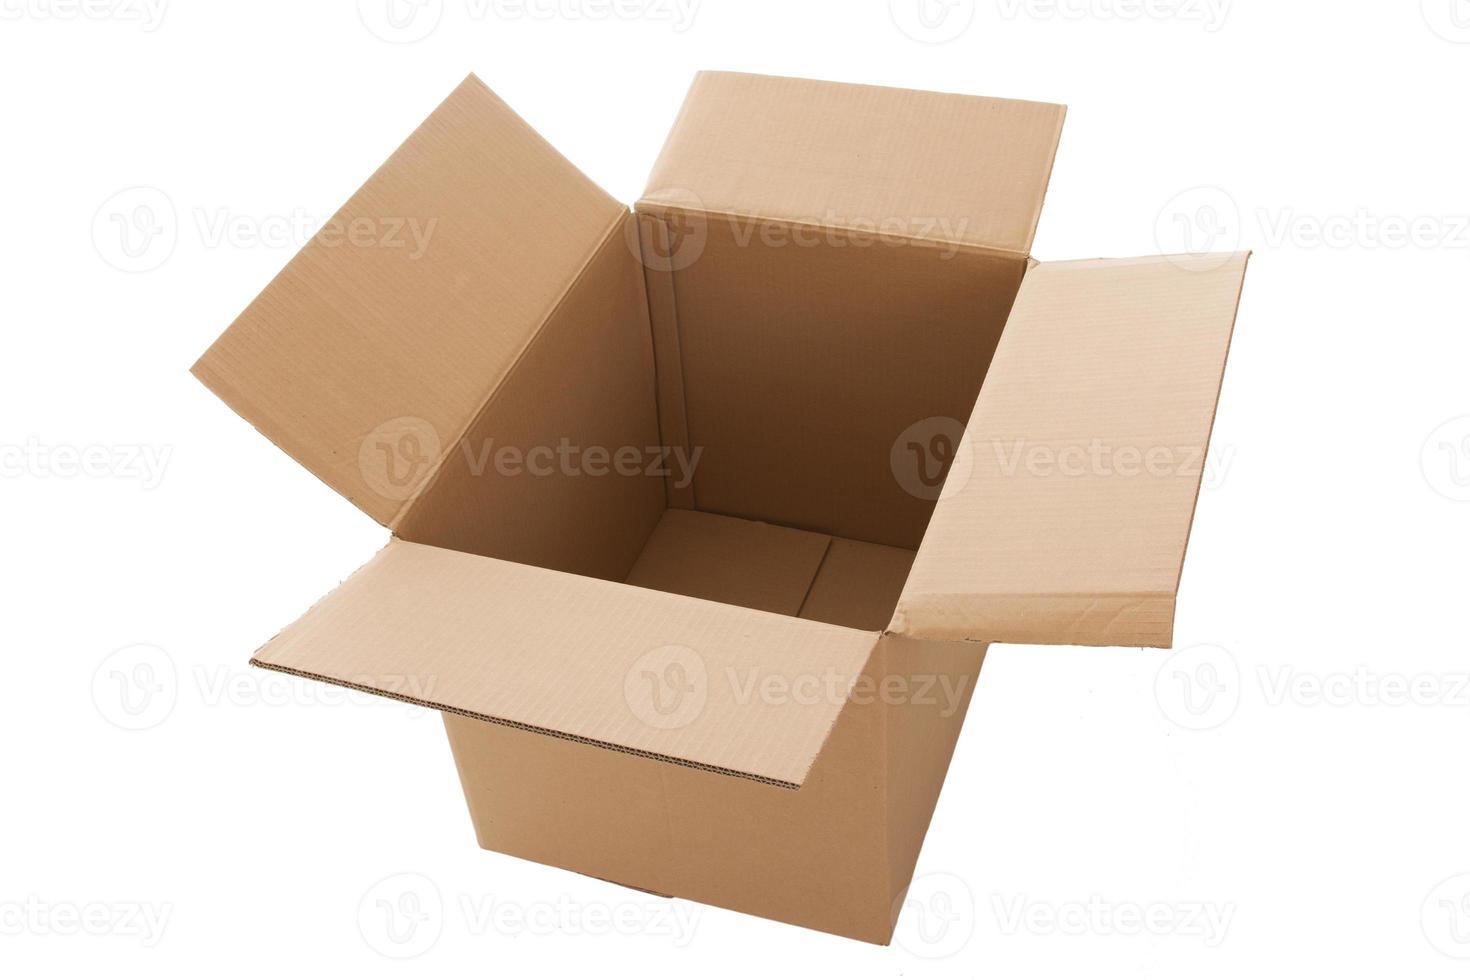 kartong låda foto